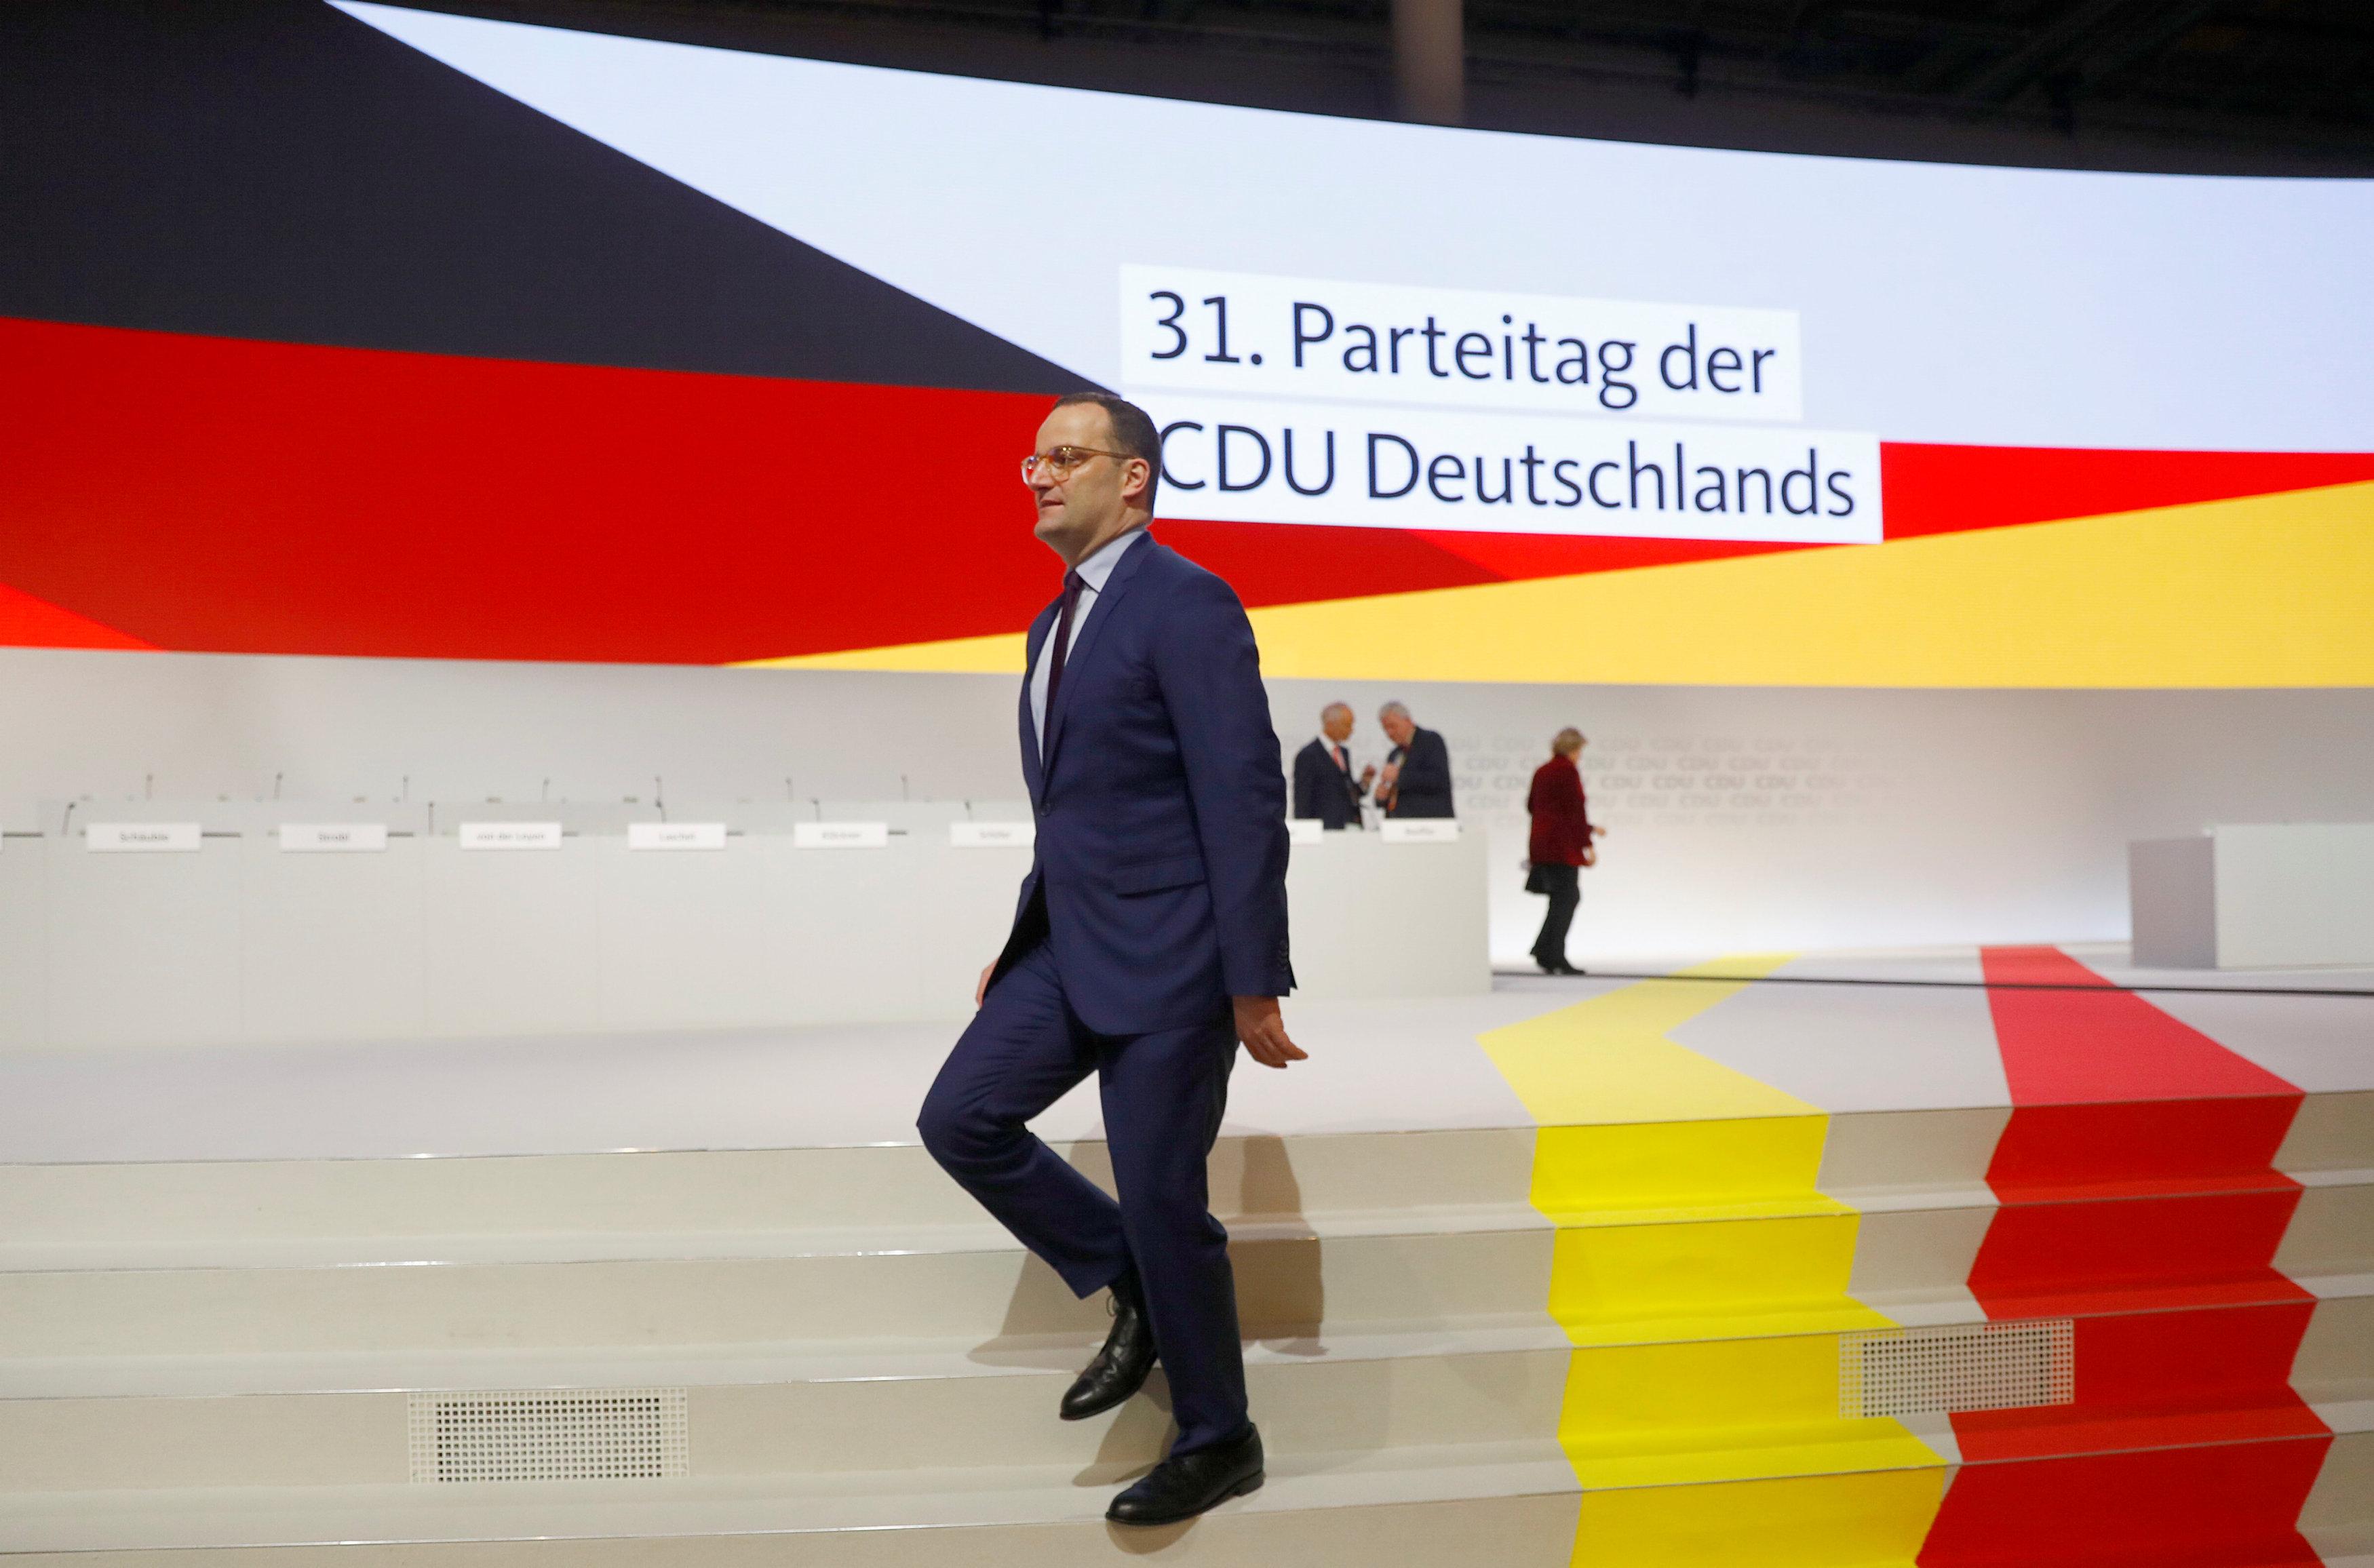 2018 12 07T085620Z 1329469872 RC17991706F0 RTRMADP 3 GERMANY POLITICS CDU